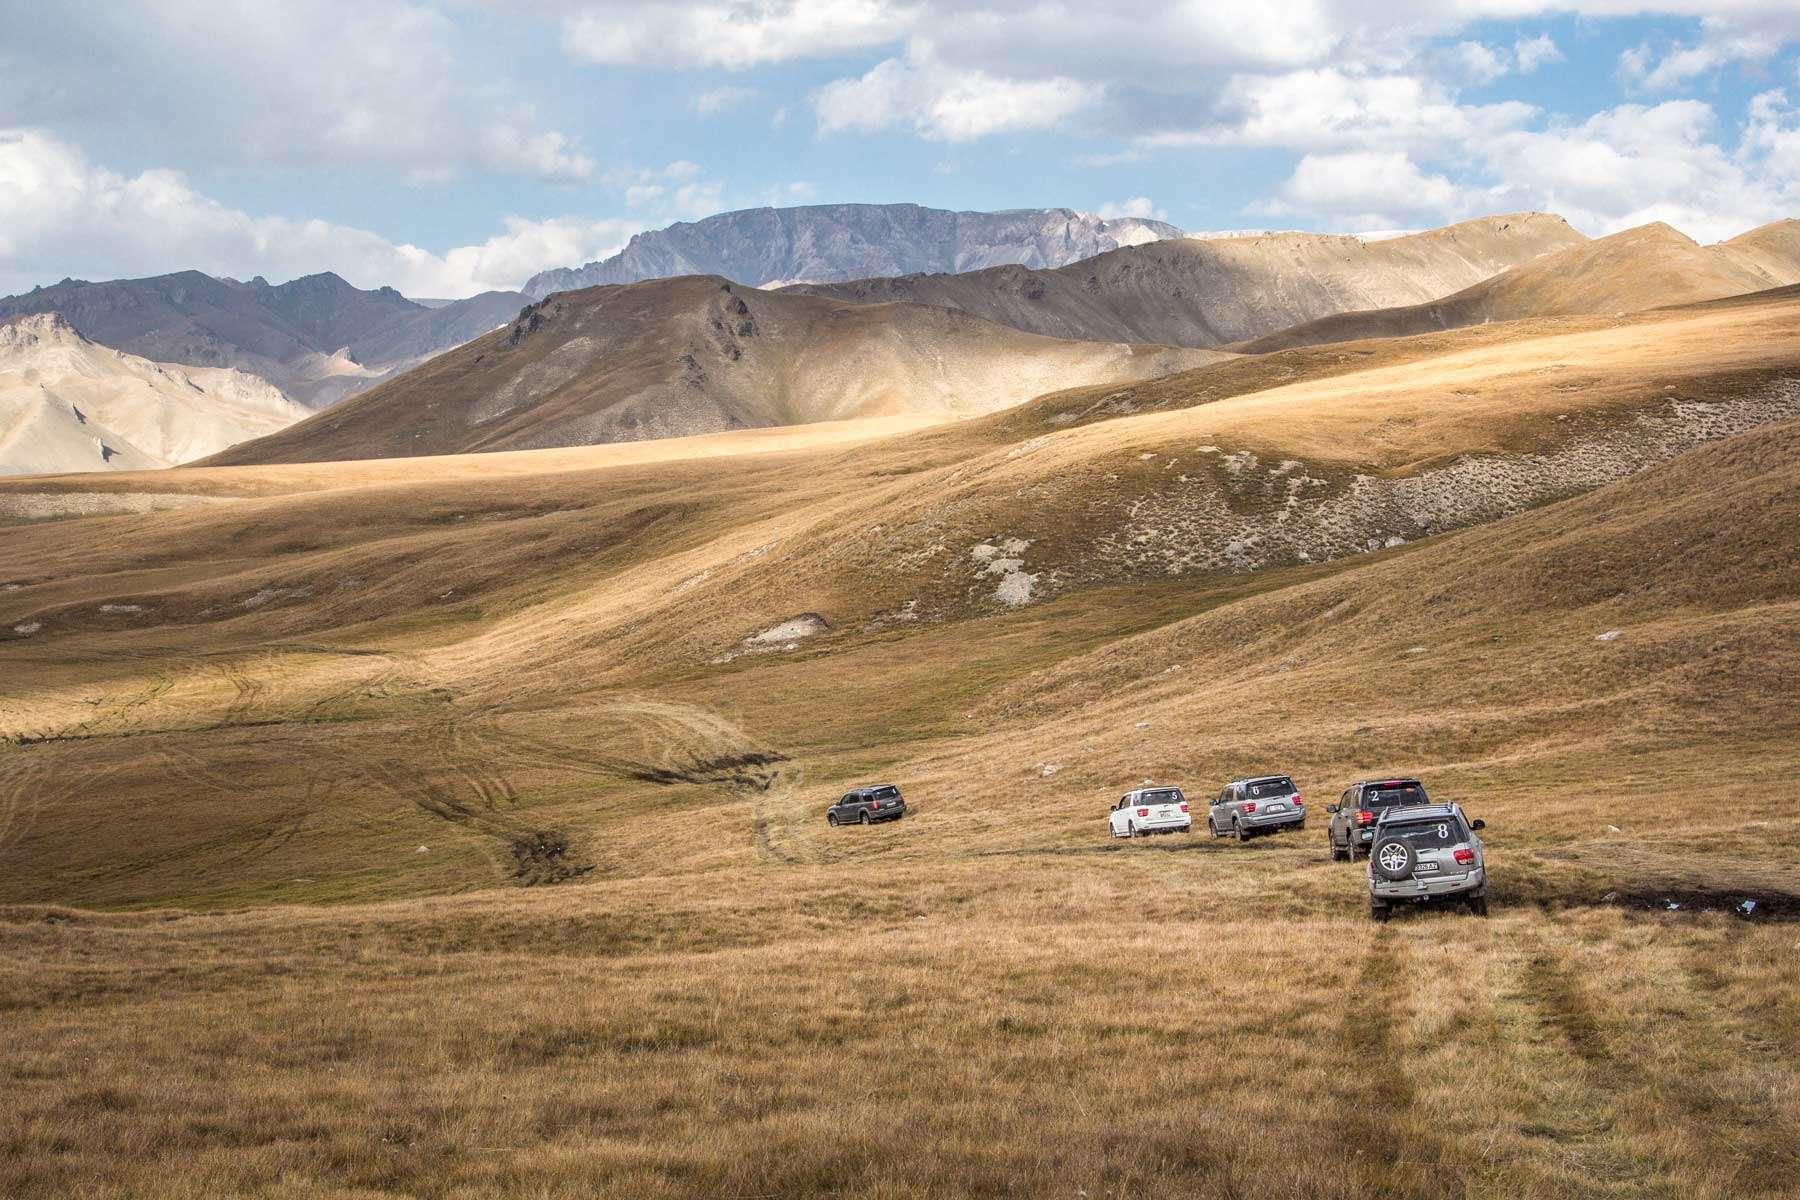 Kyrgyzstan 4x4 rentals iDrive 4x4